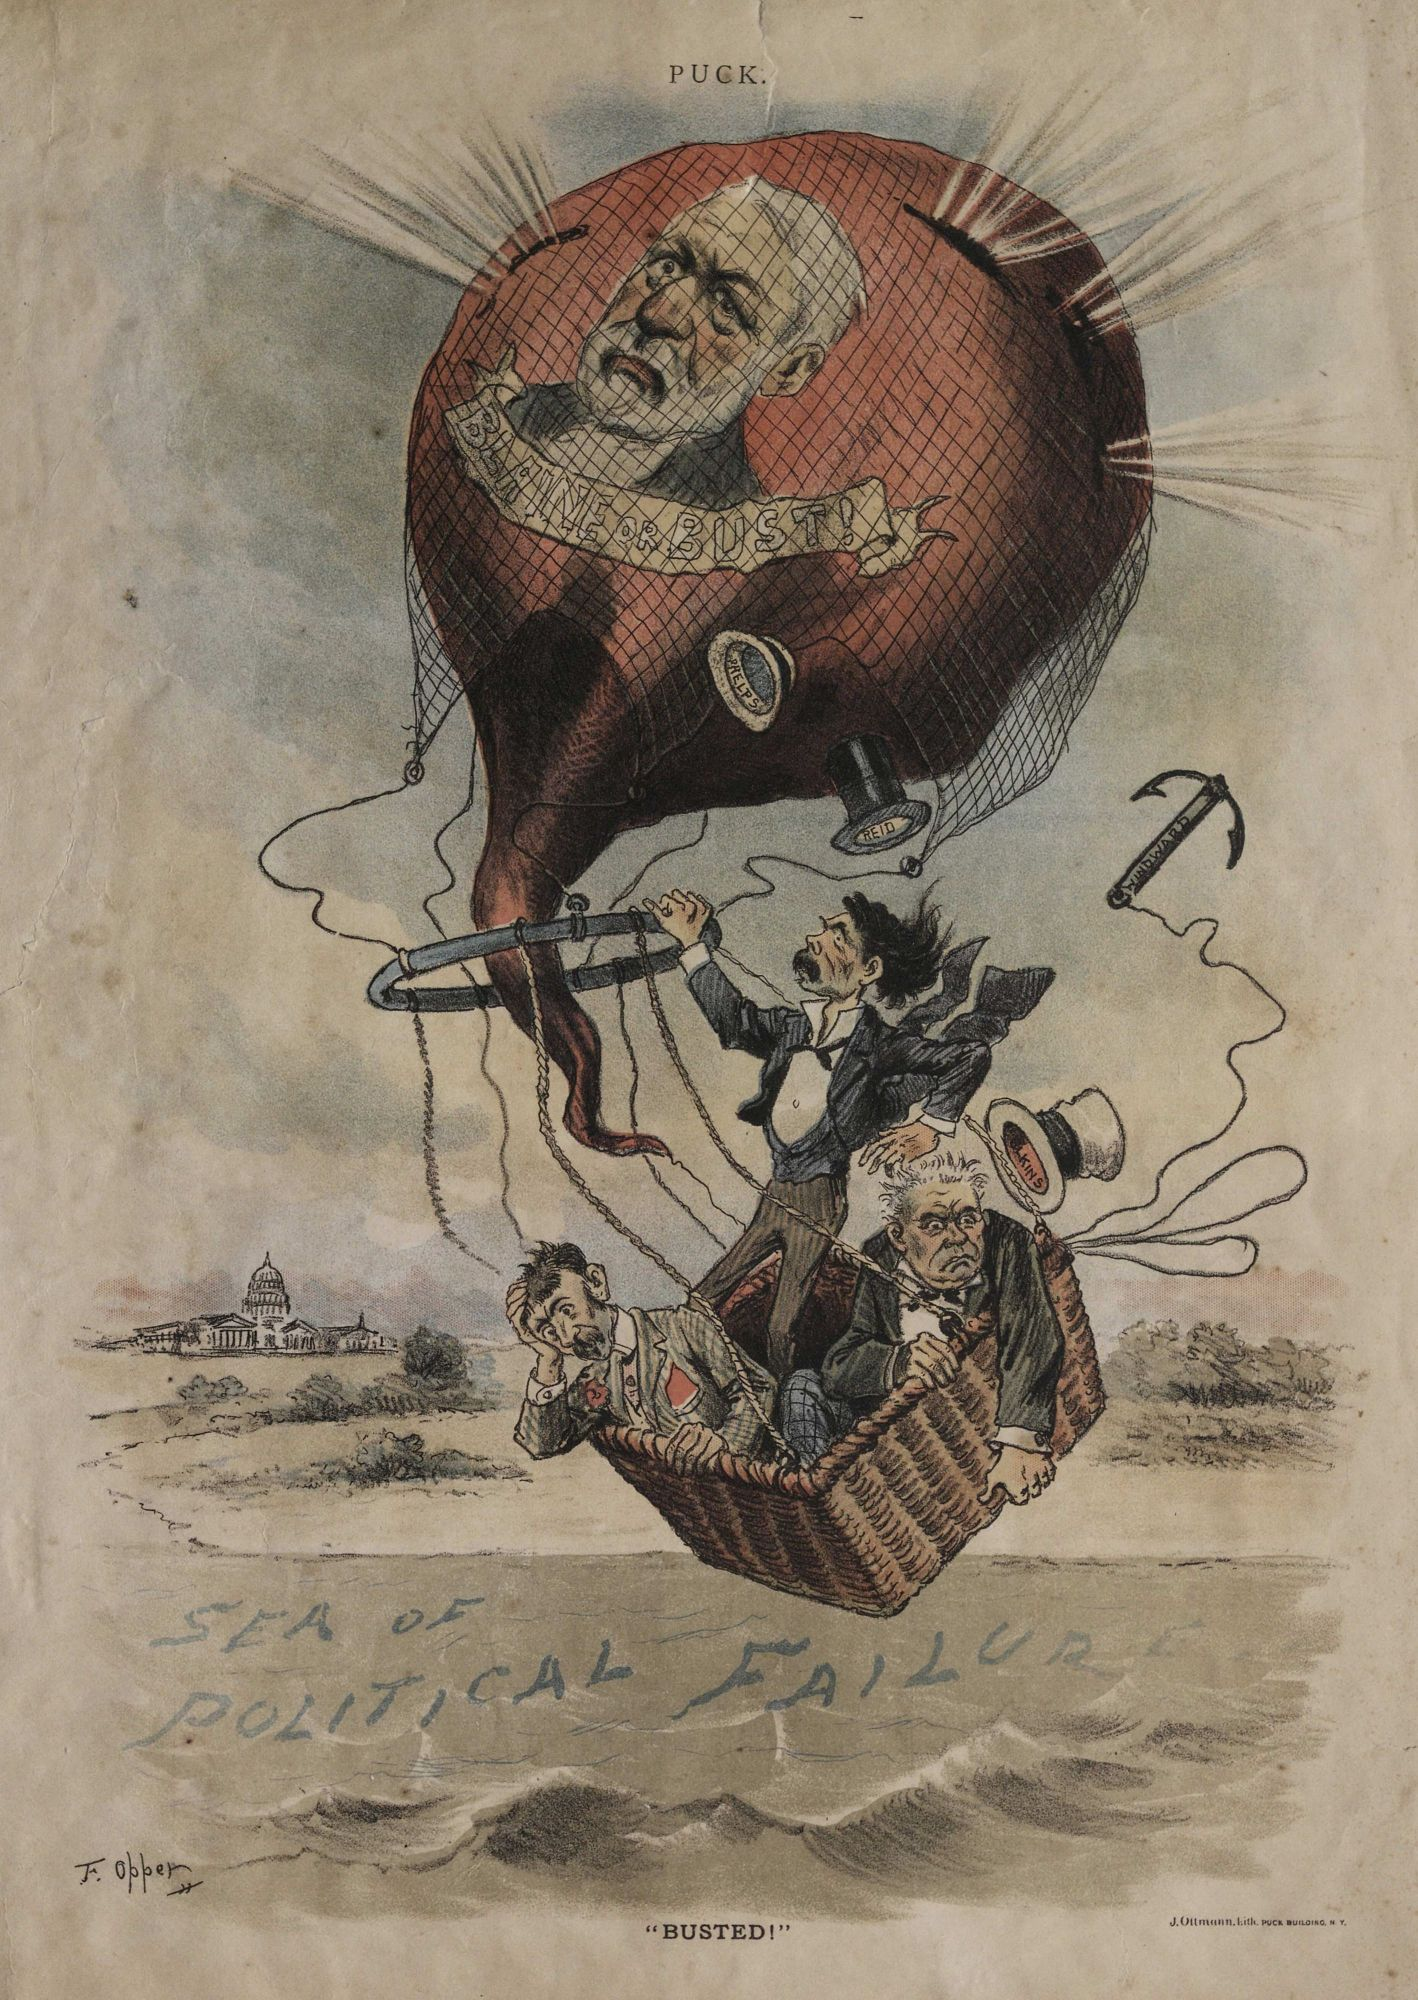 """Busted."" Political cartoon about the doomed balloon James G. Blaine"